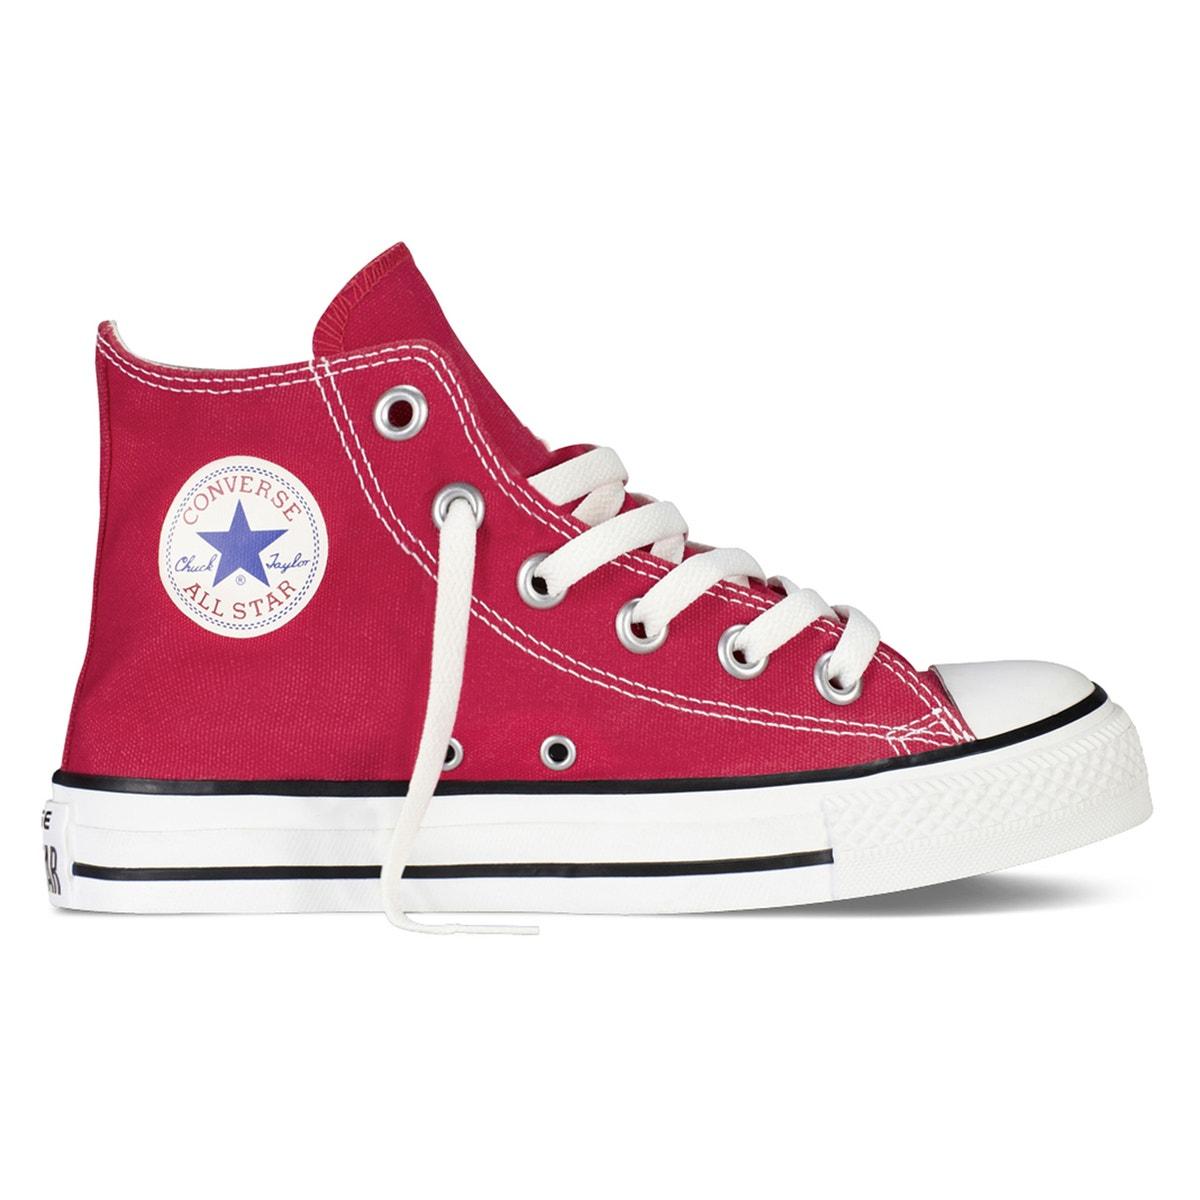 Converse - Αθλητικά παπούτσια CTAS Kids 350030369 - 9135